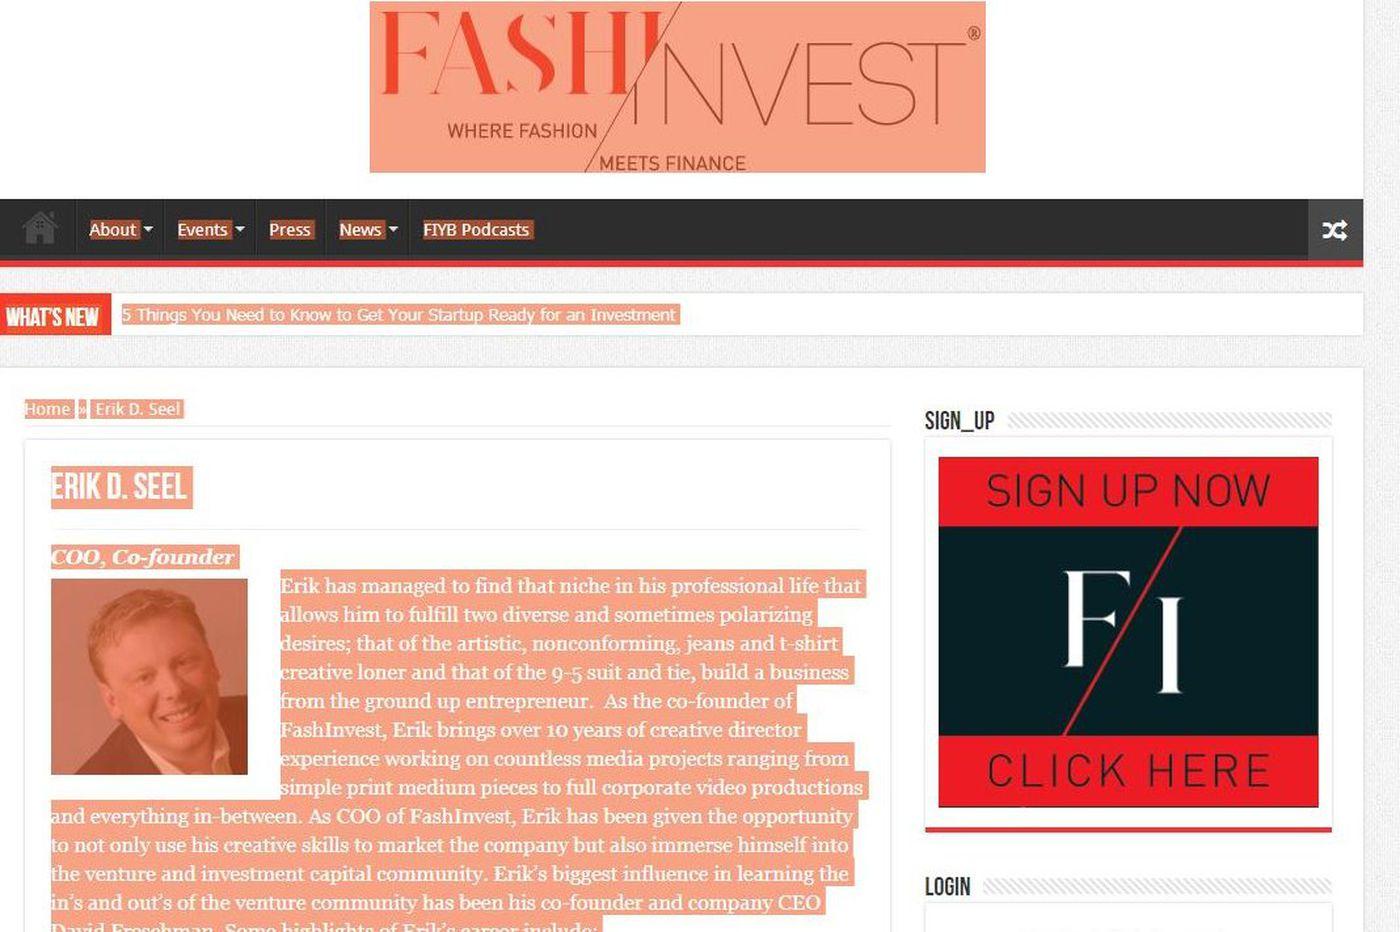 Fashion news site FashInvest bought by Fairchild Fashion/Penske Media